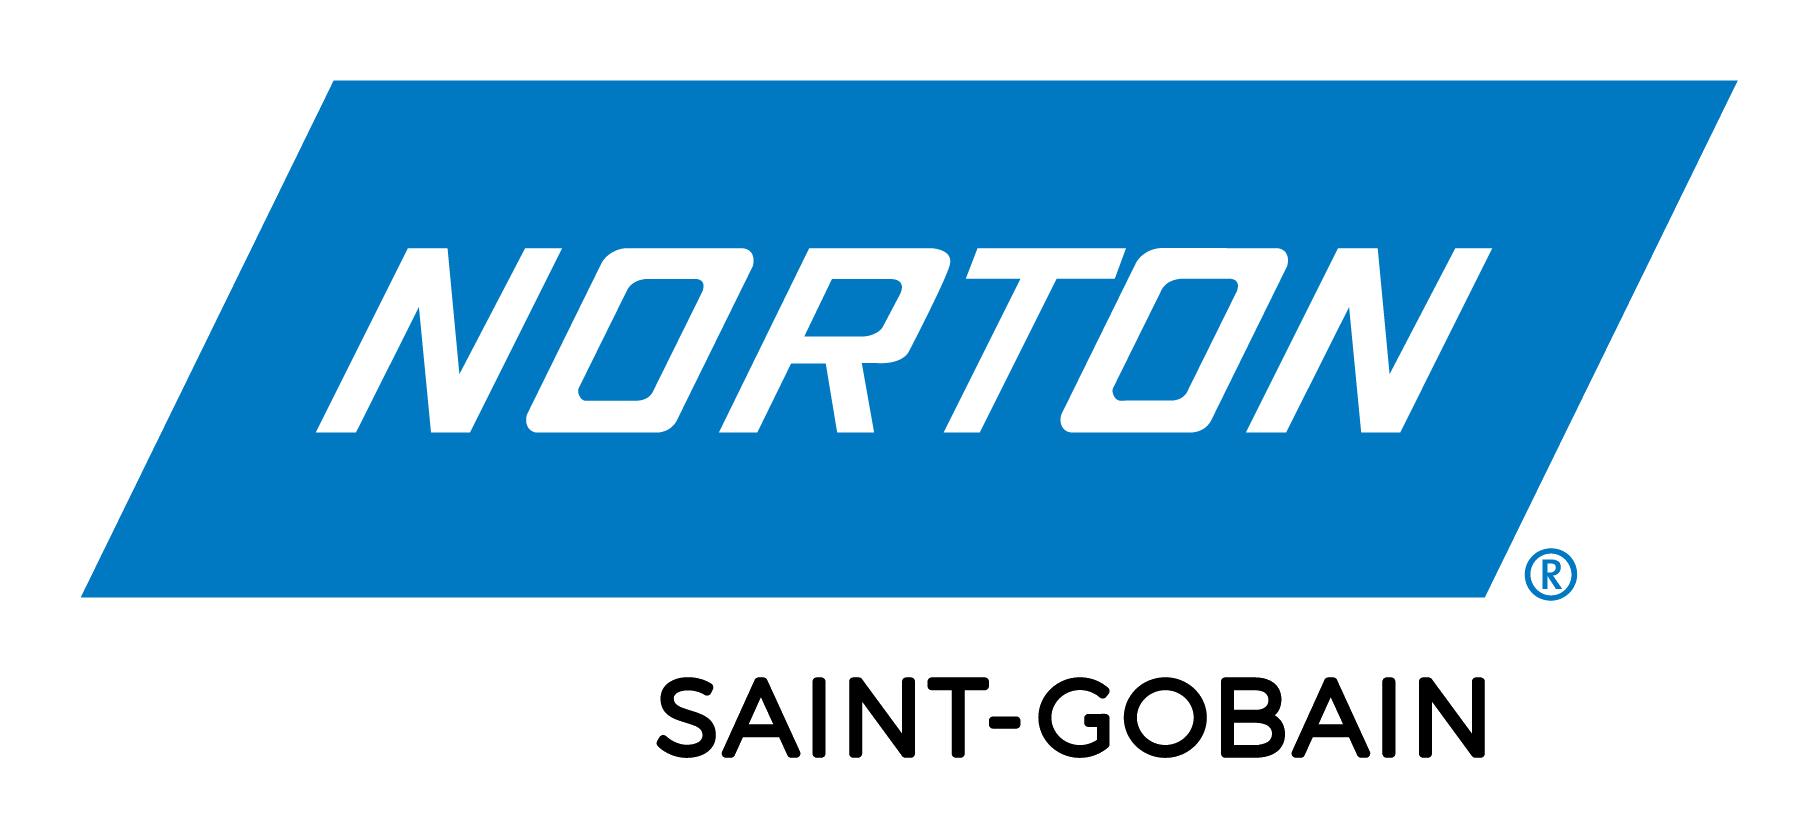 Lixa Massa Paredes Alvenaria Norton 01 Unid Todos Os Grãos